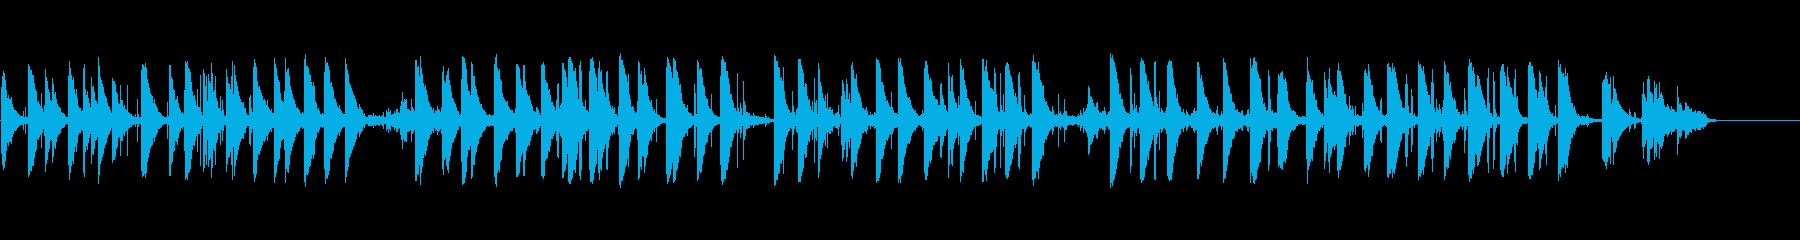 TIN:ラトルメタルフォーリー;ク...の再生済みの波形